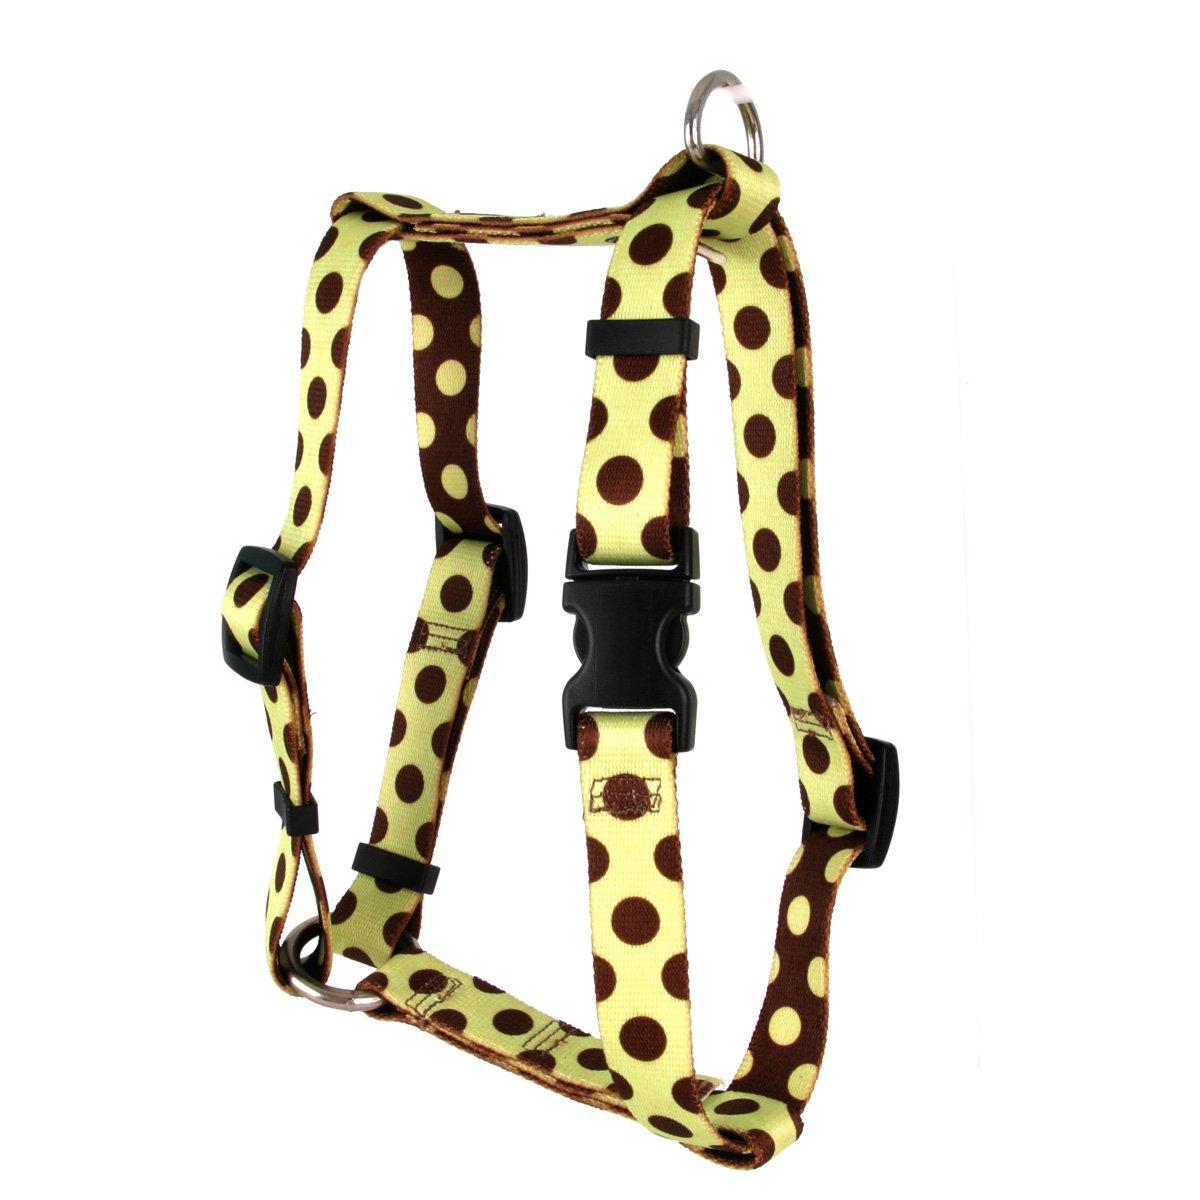 Yellow Dog Design Green and Brown Polka Dot Roman Style H Dog Harness, Small/Medium